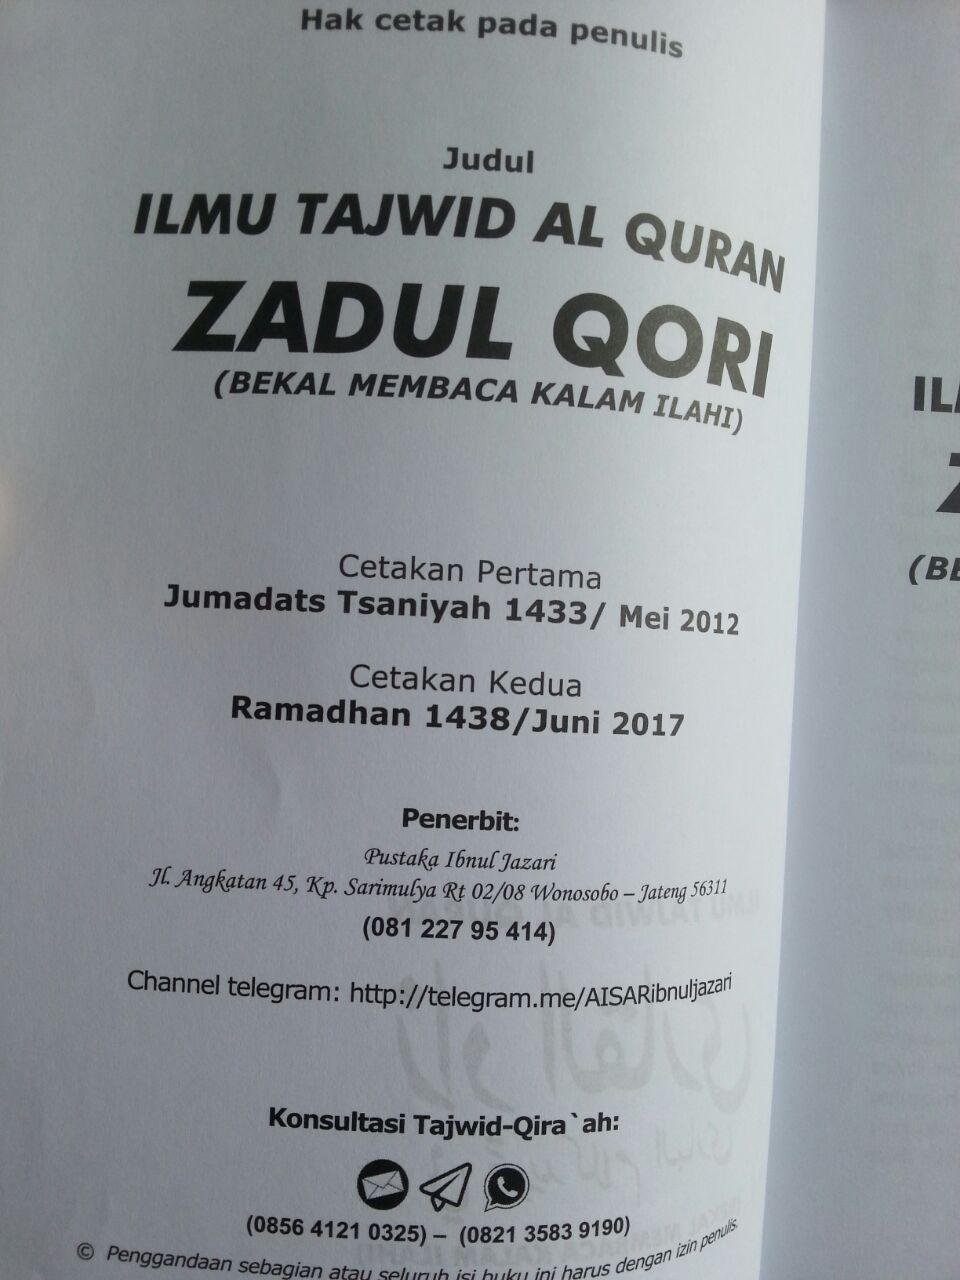 Buku Zadul Qori Bekal Membaca Kalam Ilahi isi 2